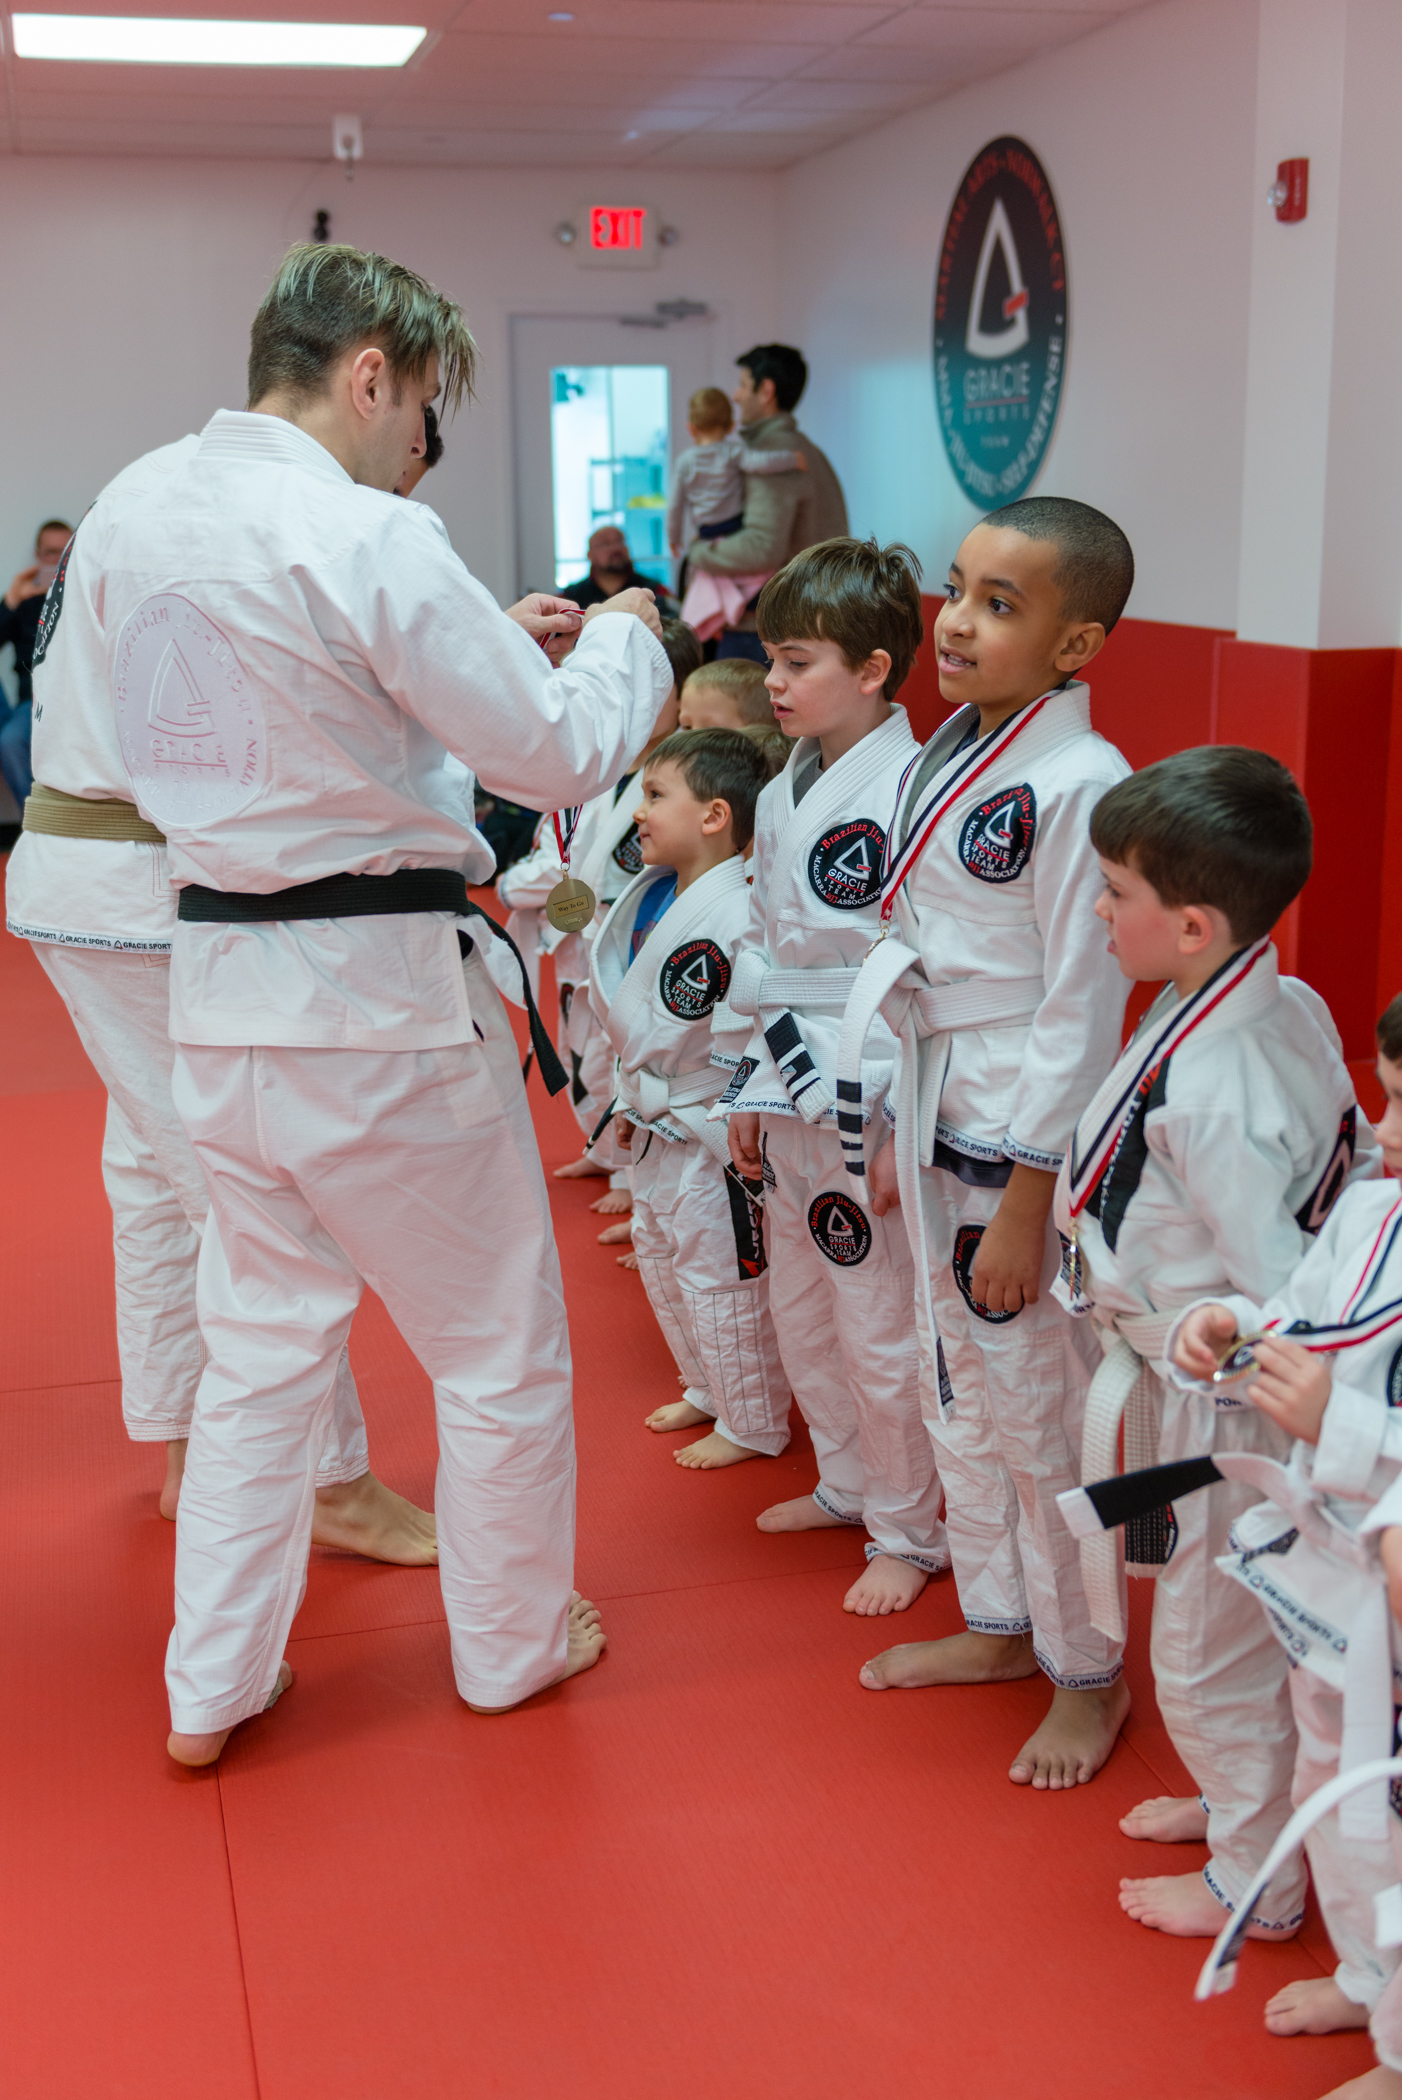 Gracie-Sports-Kids-44.jpg